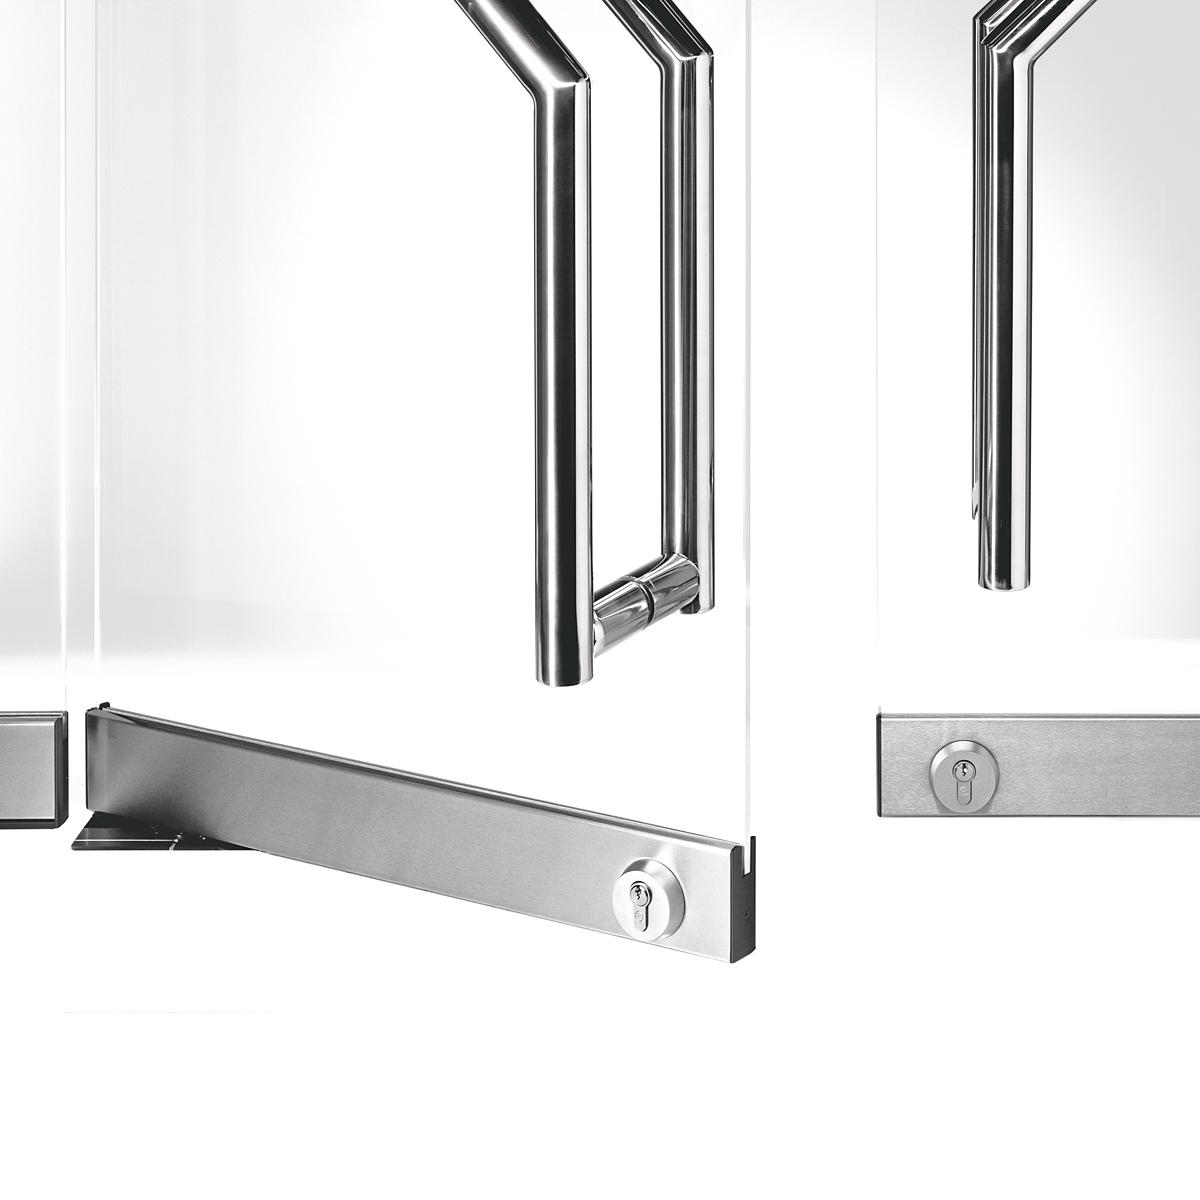 Fittings for toughened glass assemblies tpta door rails planetlyrics Images